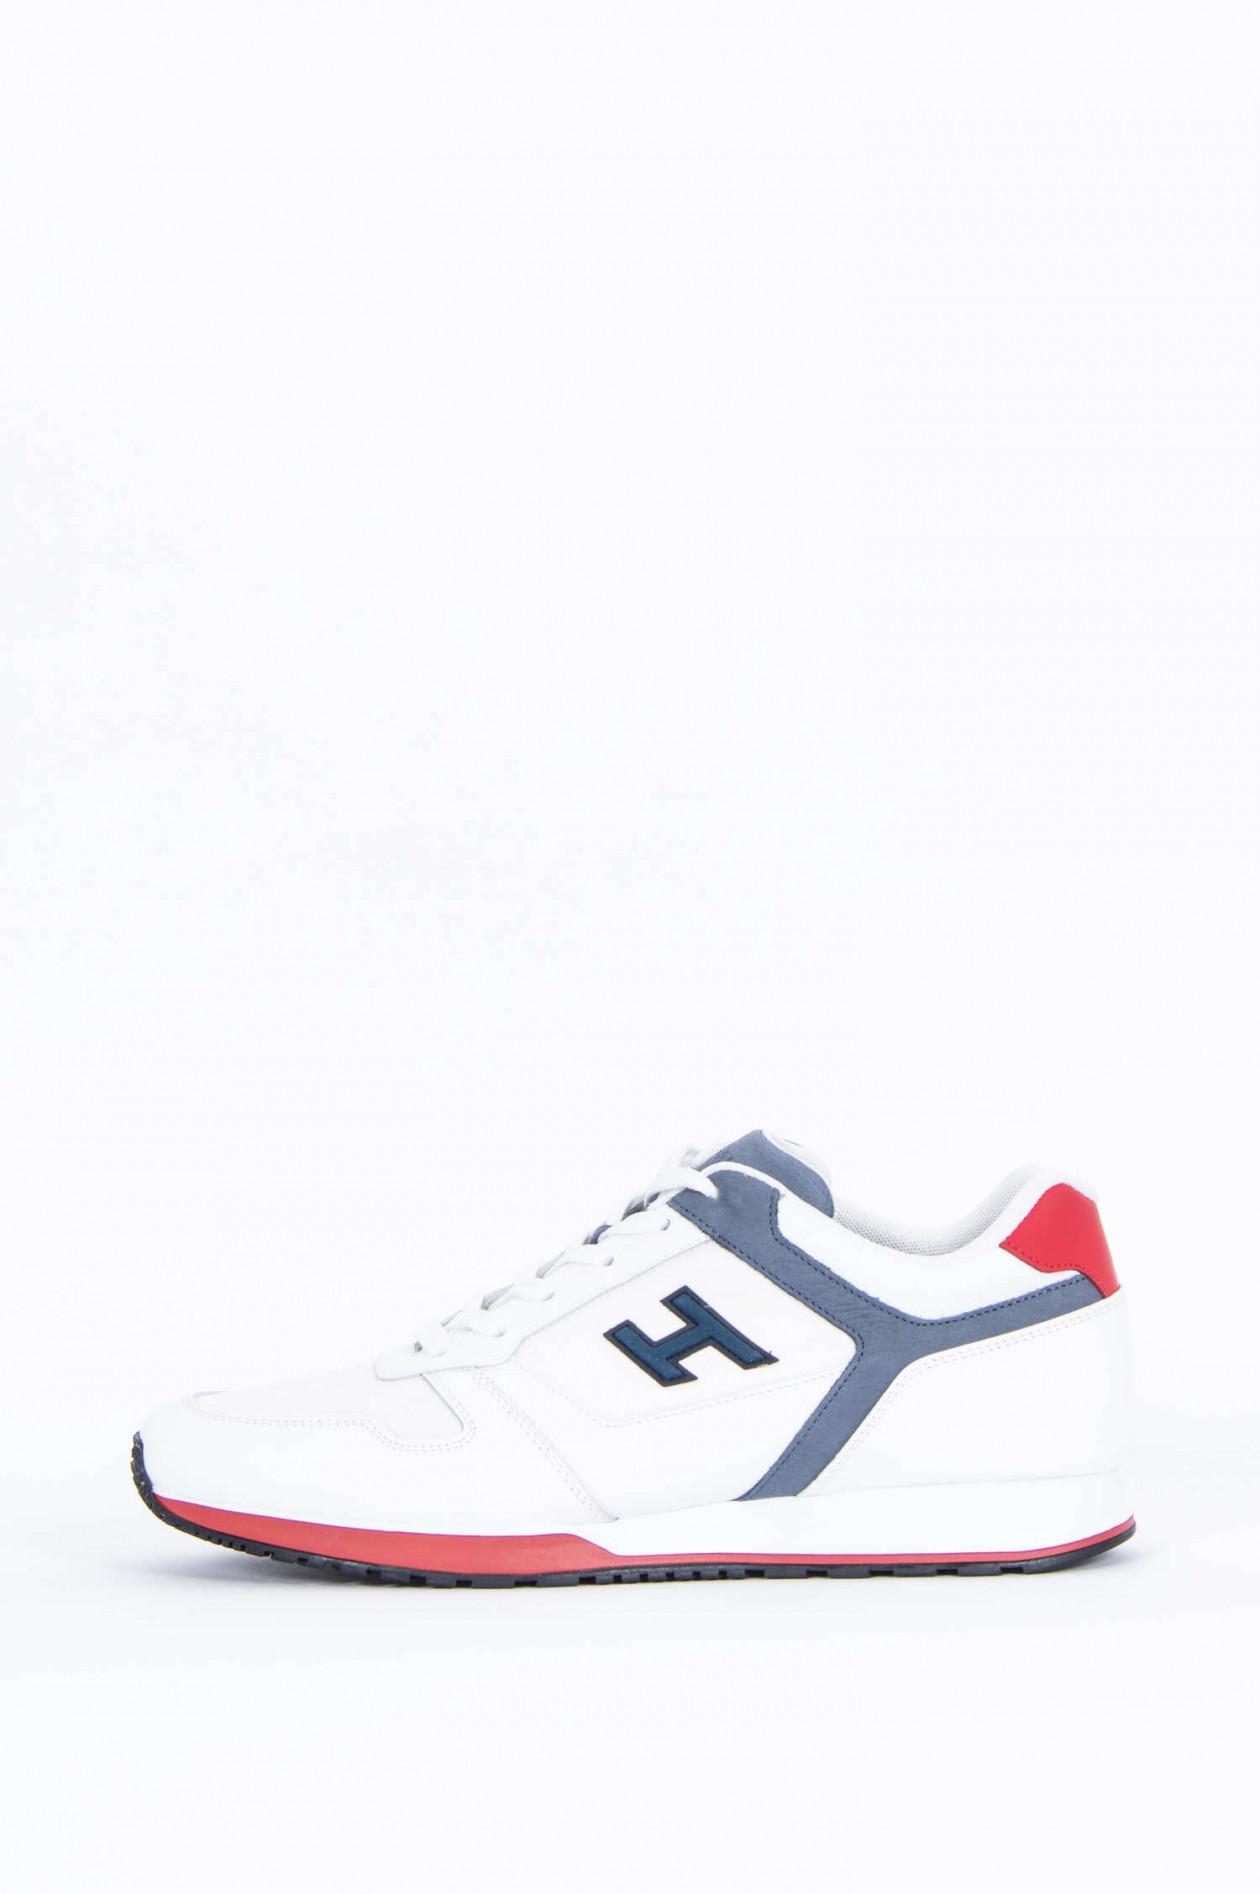 Sneaker H321 mit Lederdetails in WeißGrauRot